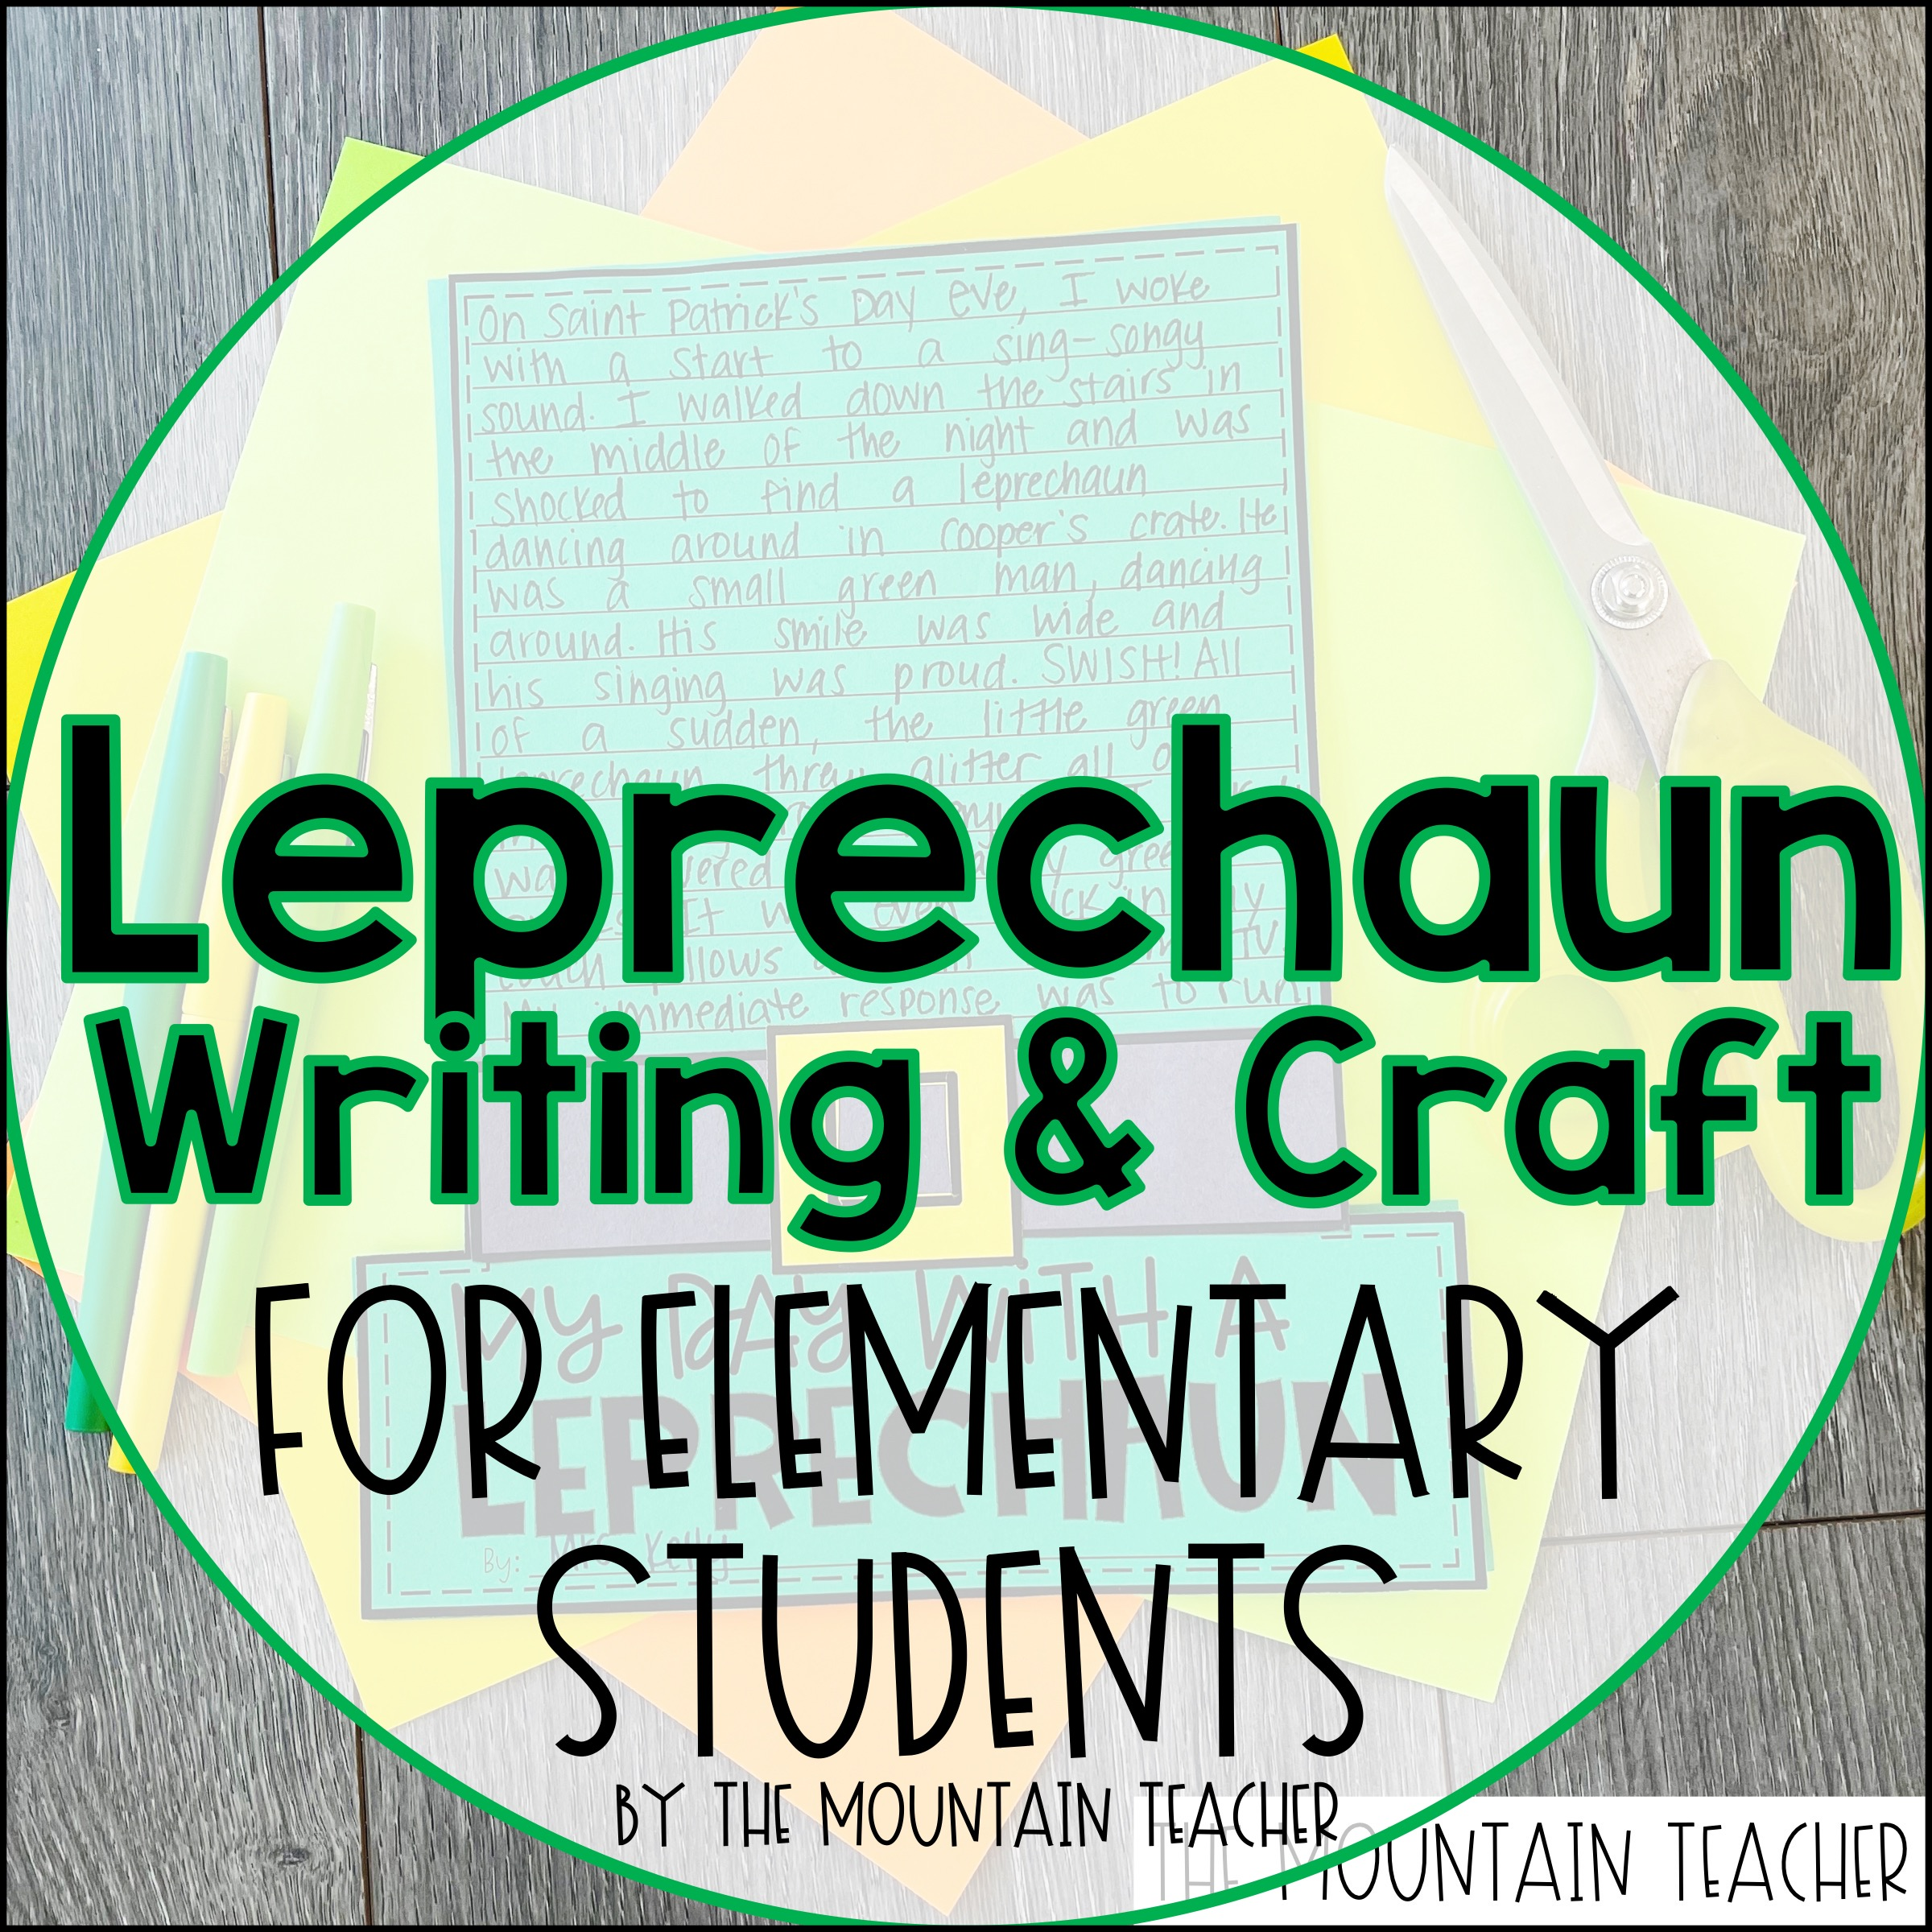 Leprechaun Writing and Craft Idea Blog Post by The Mountain Teacher01